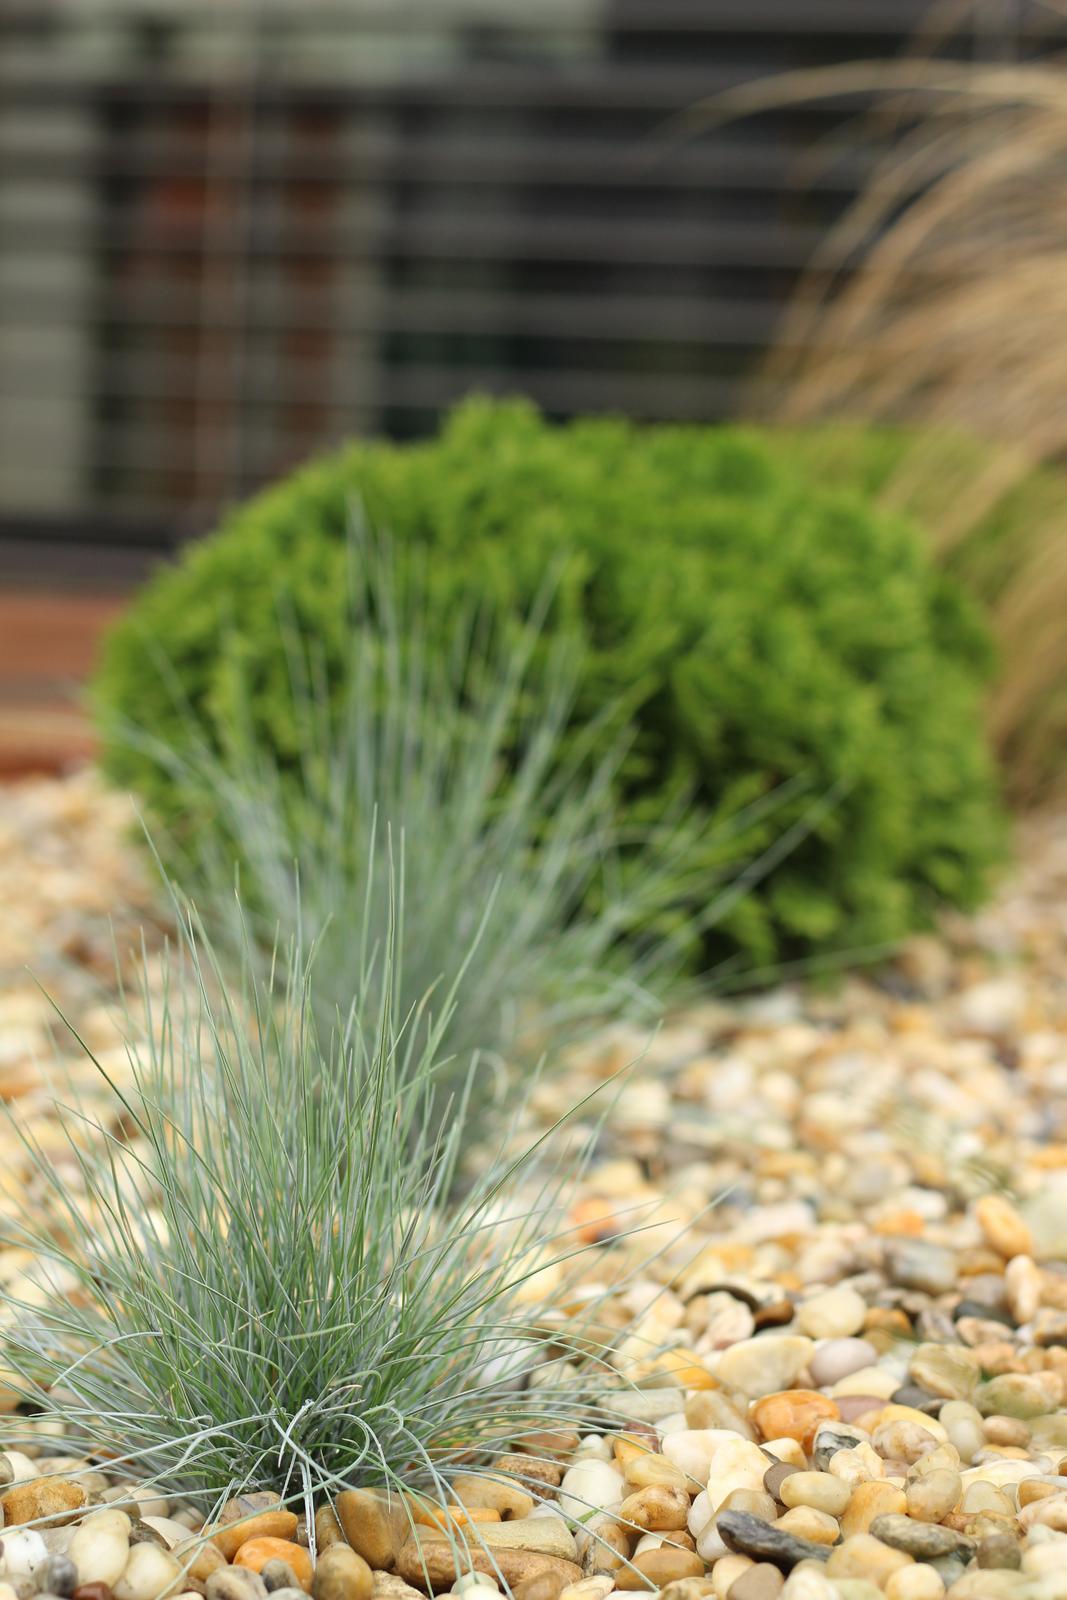 Exteriér - záhrada - Obrázok č. 85